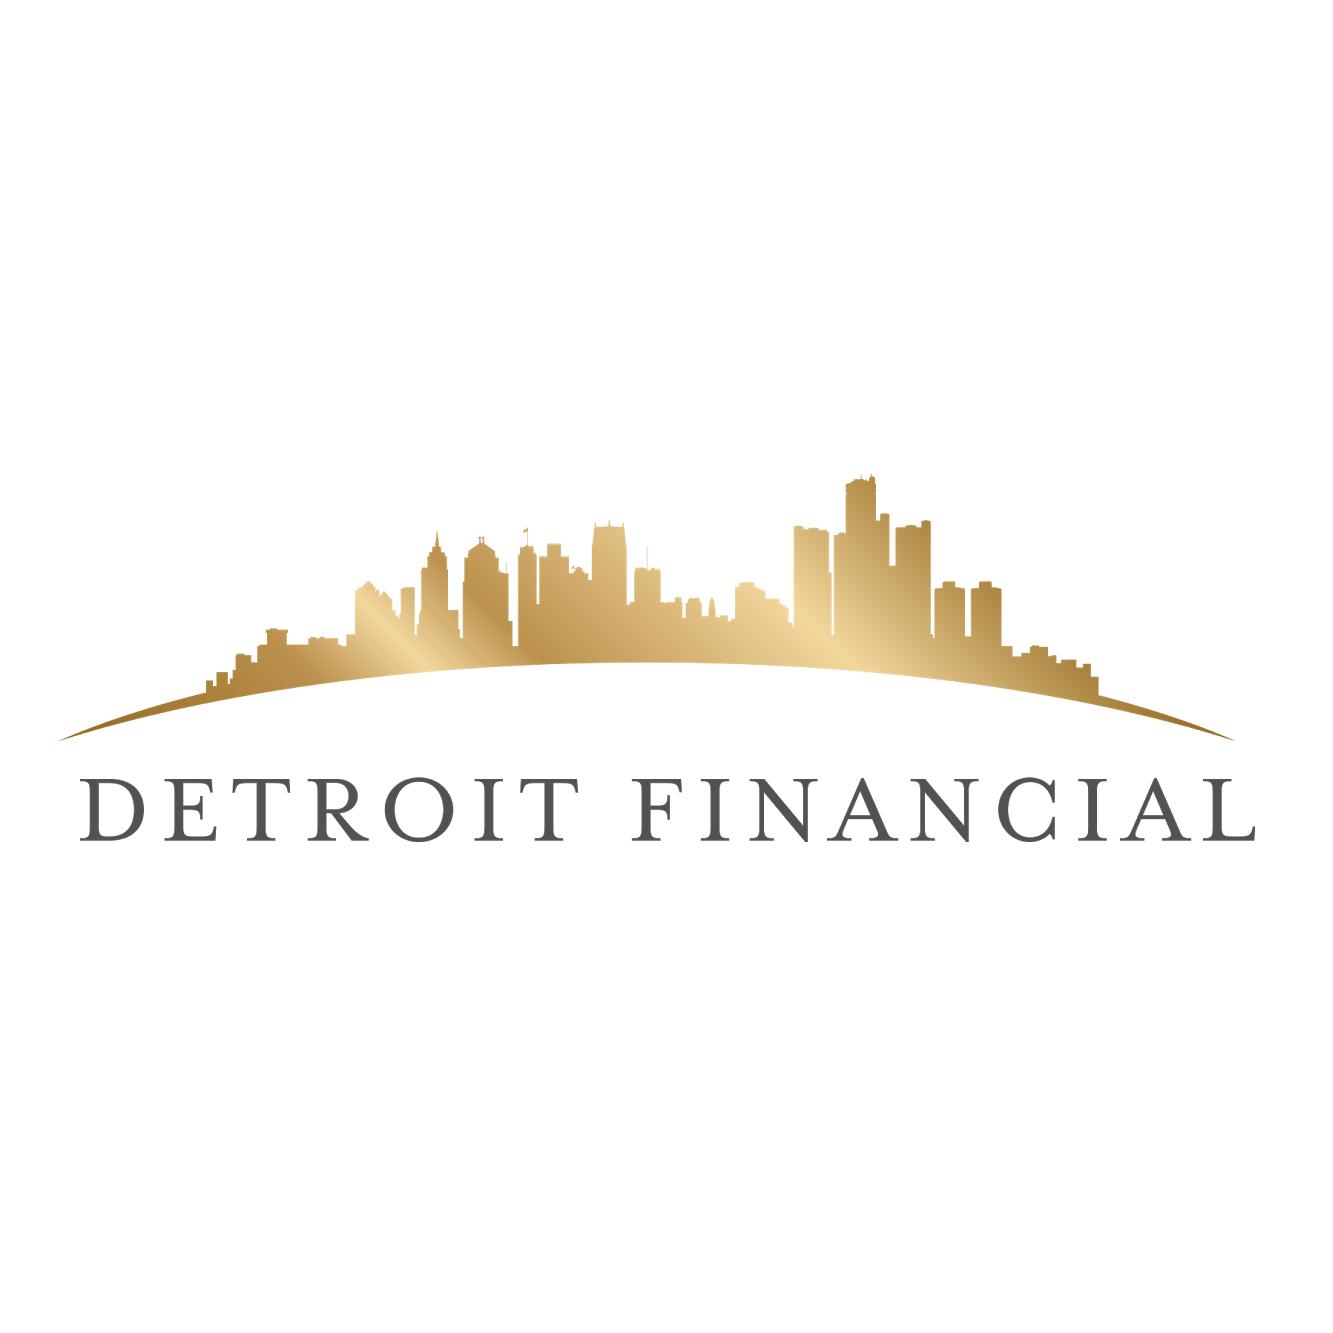 Detroit Financial